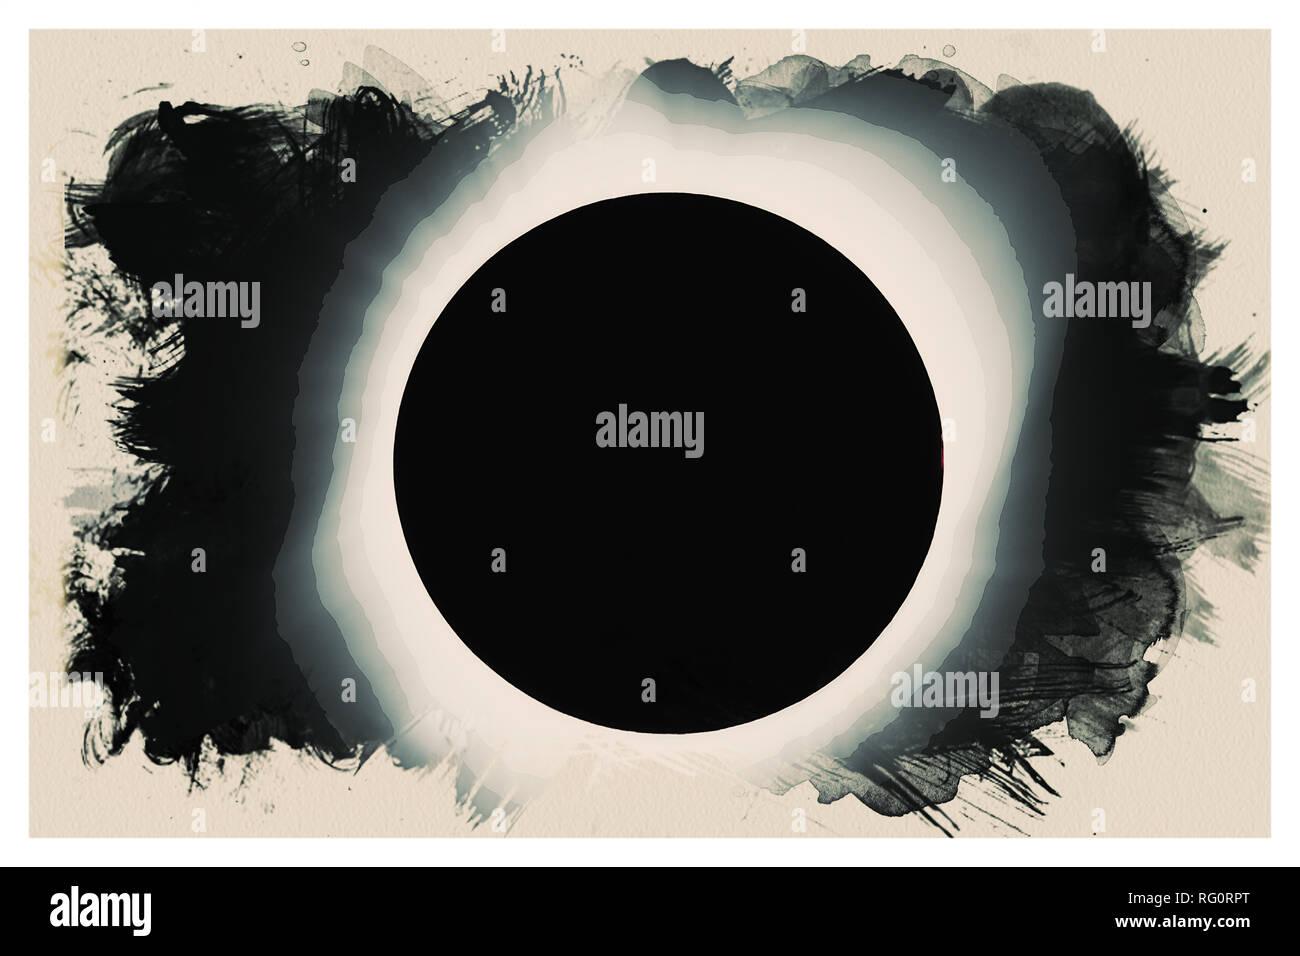 Solar eclipse 2017 Watercolor.jpg - RG0RPT 1RG0RPT - Stock Image